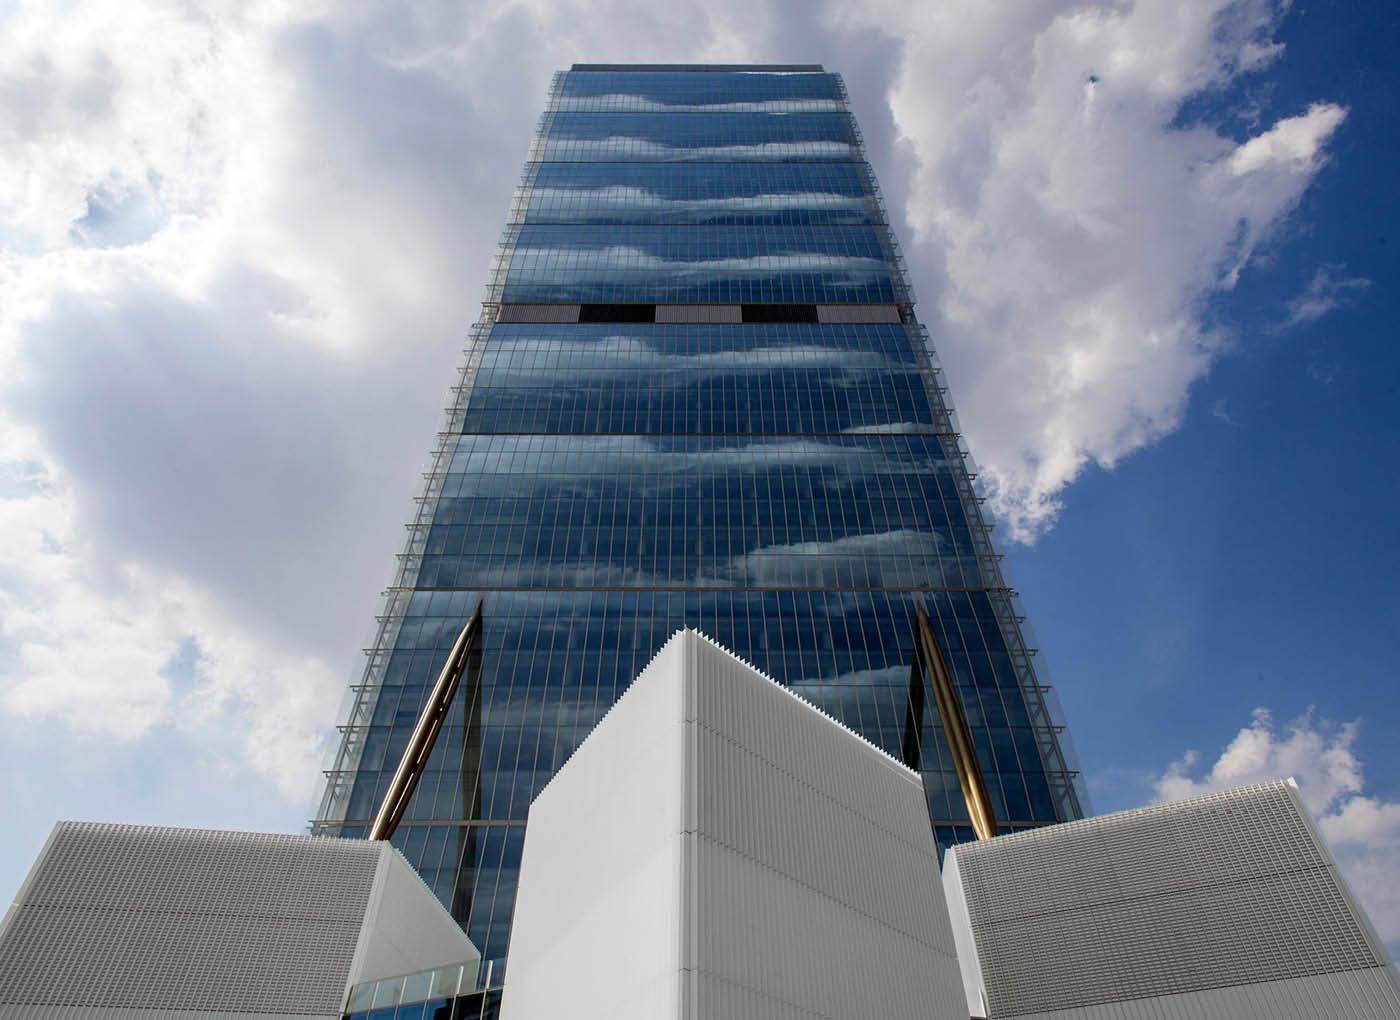 torre-isozaki-citylife-lecacem-classic-sottofonodi-2